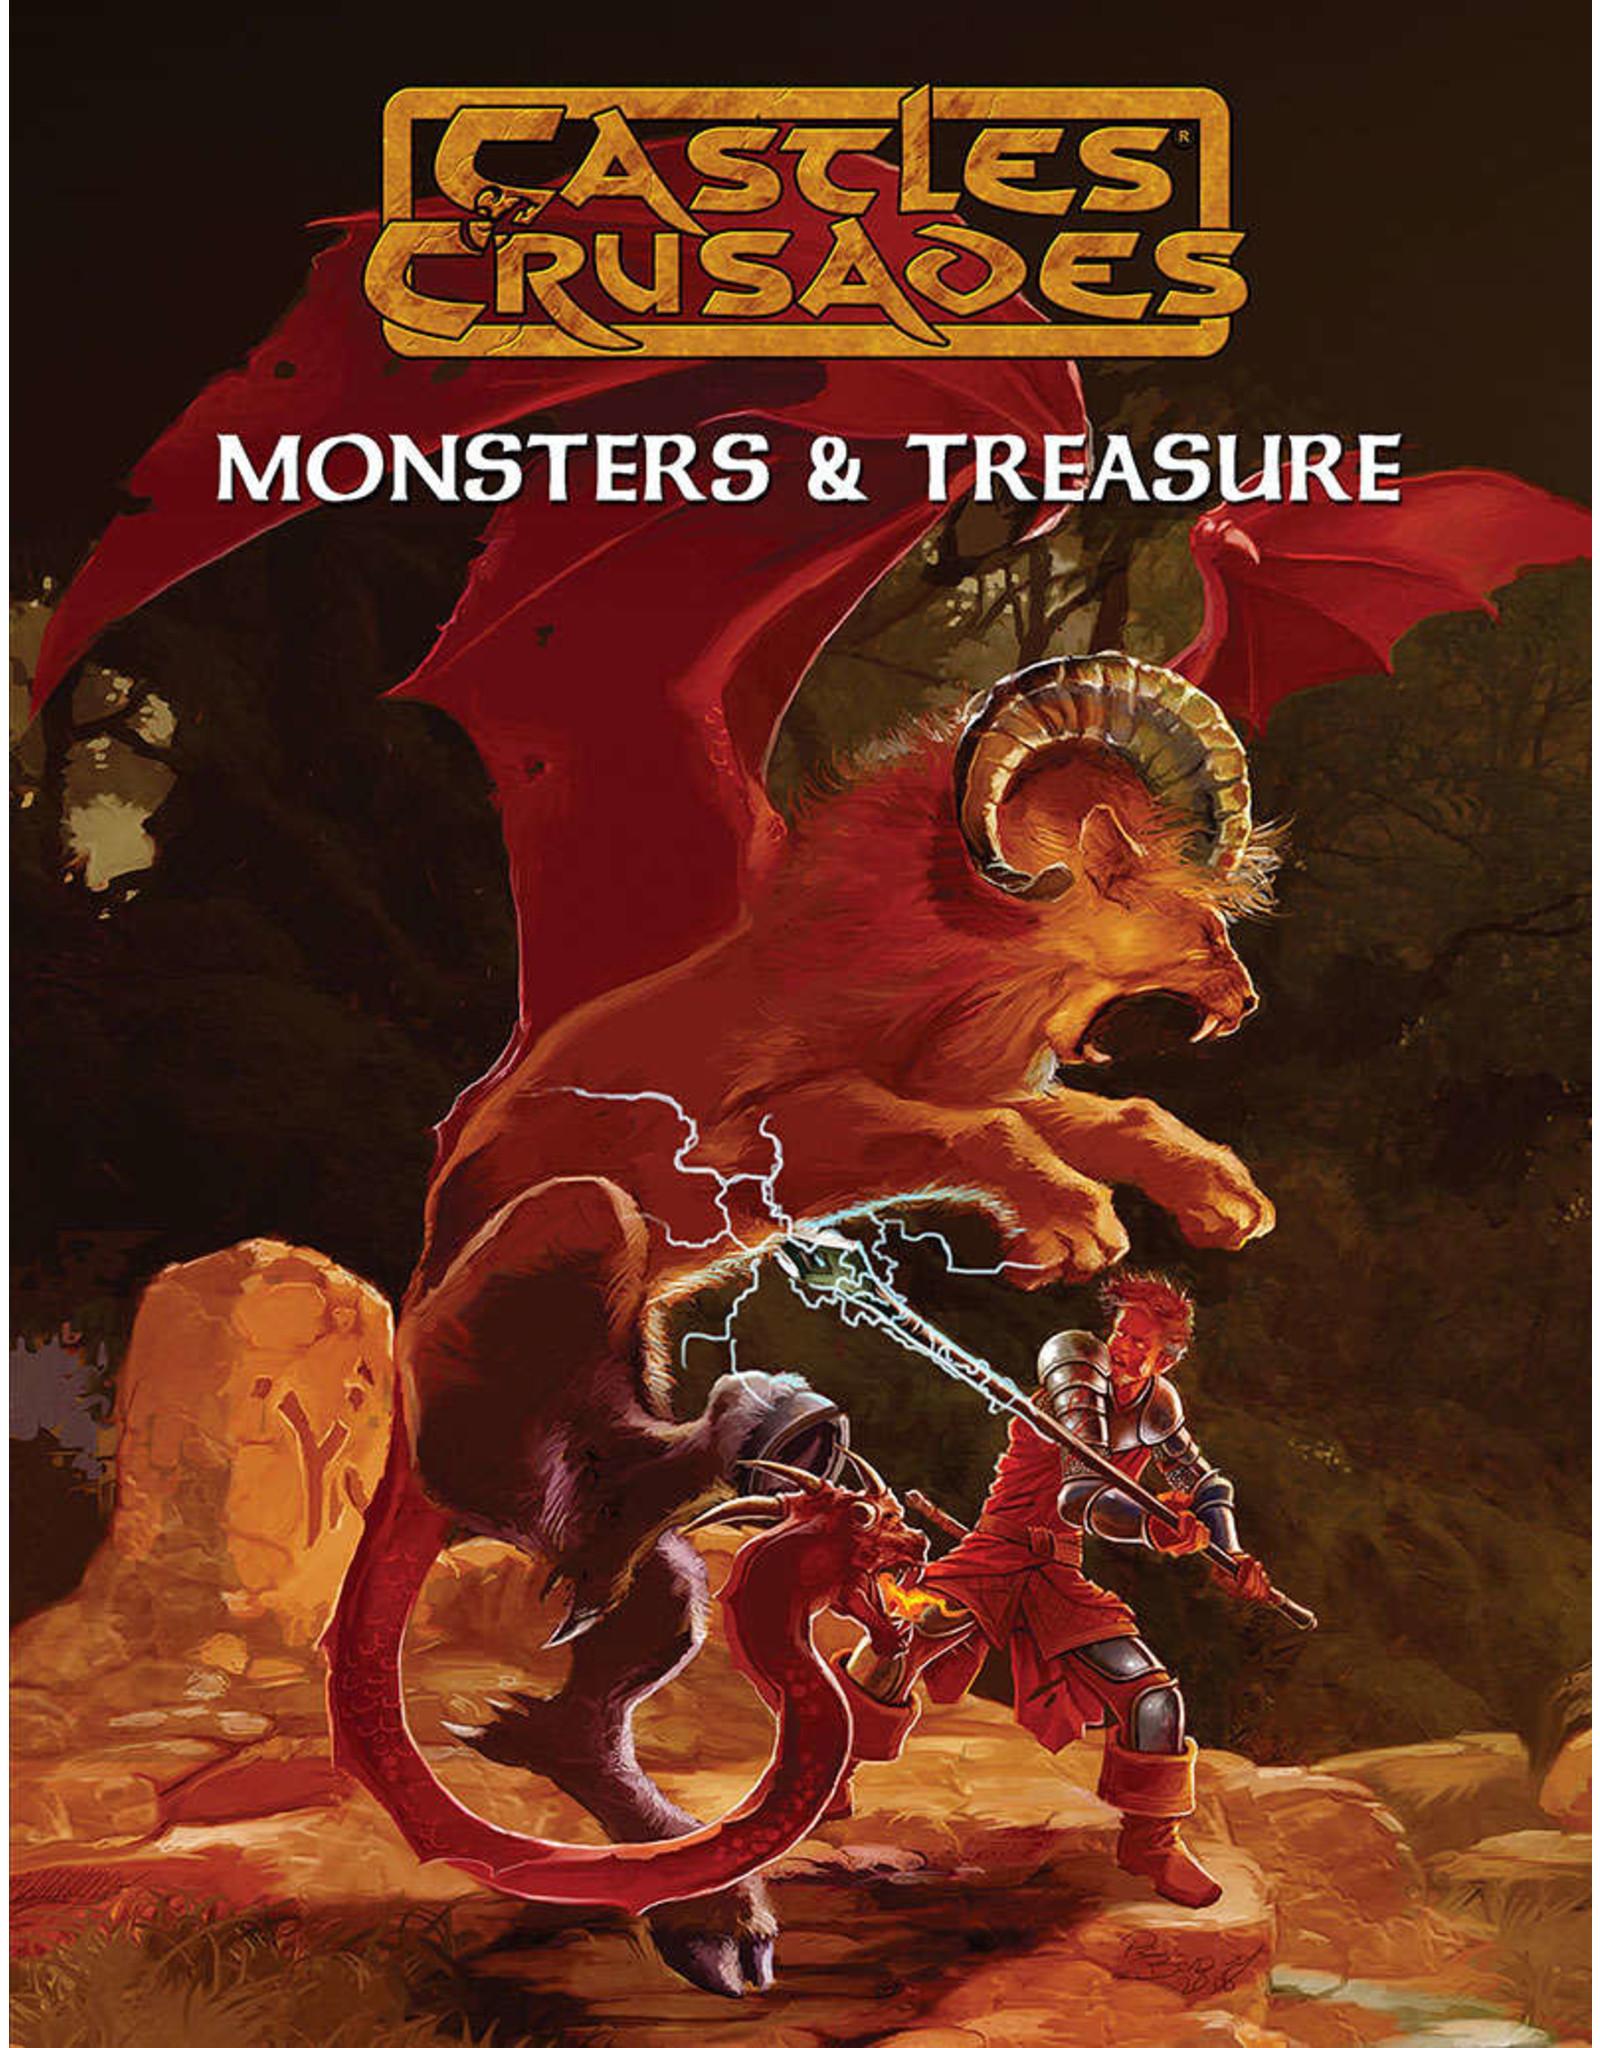 Castles & Crusades RPG Classic Monsters & Treasures